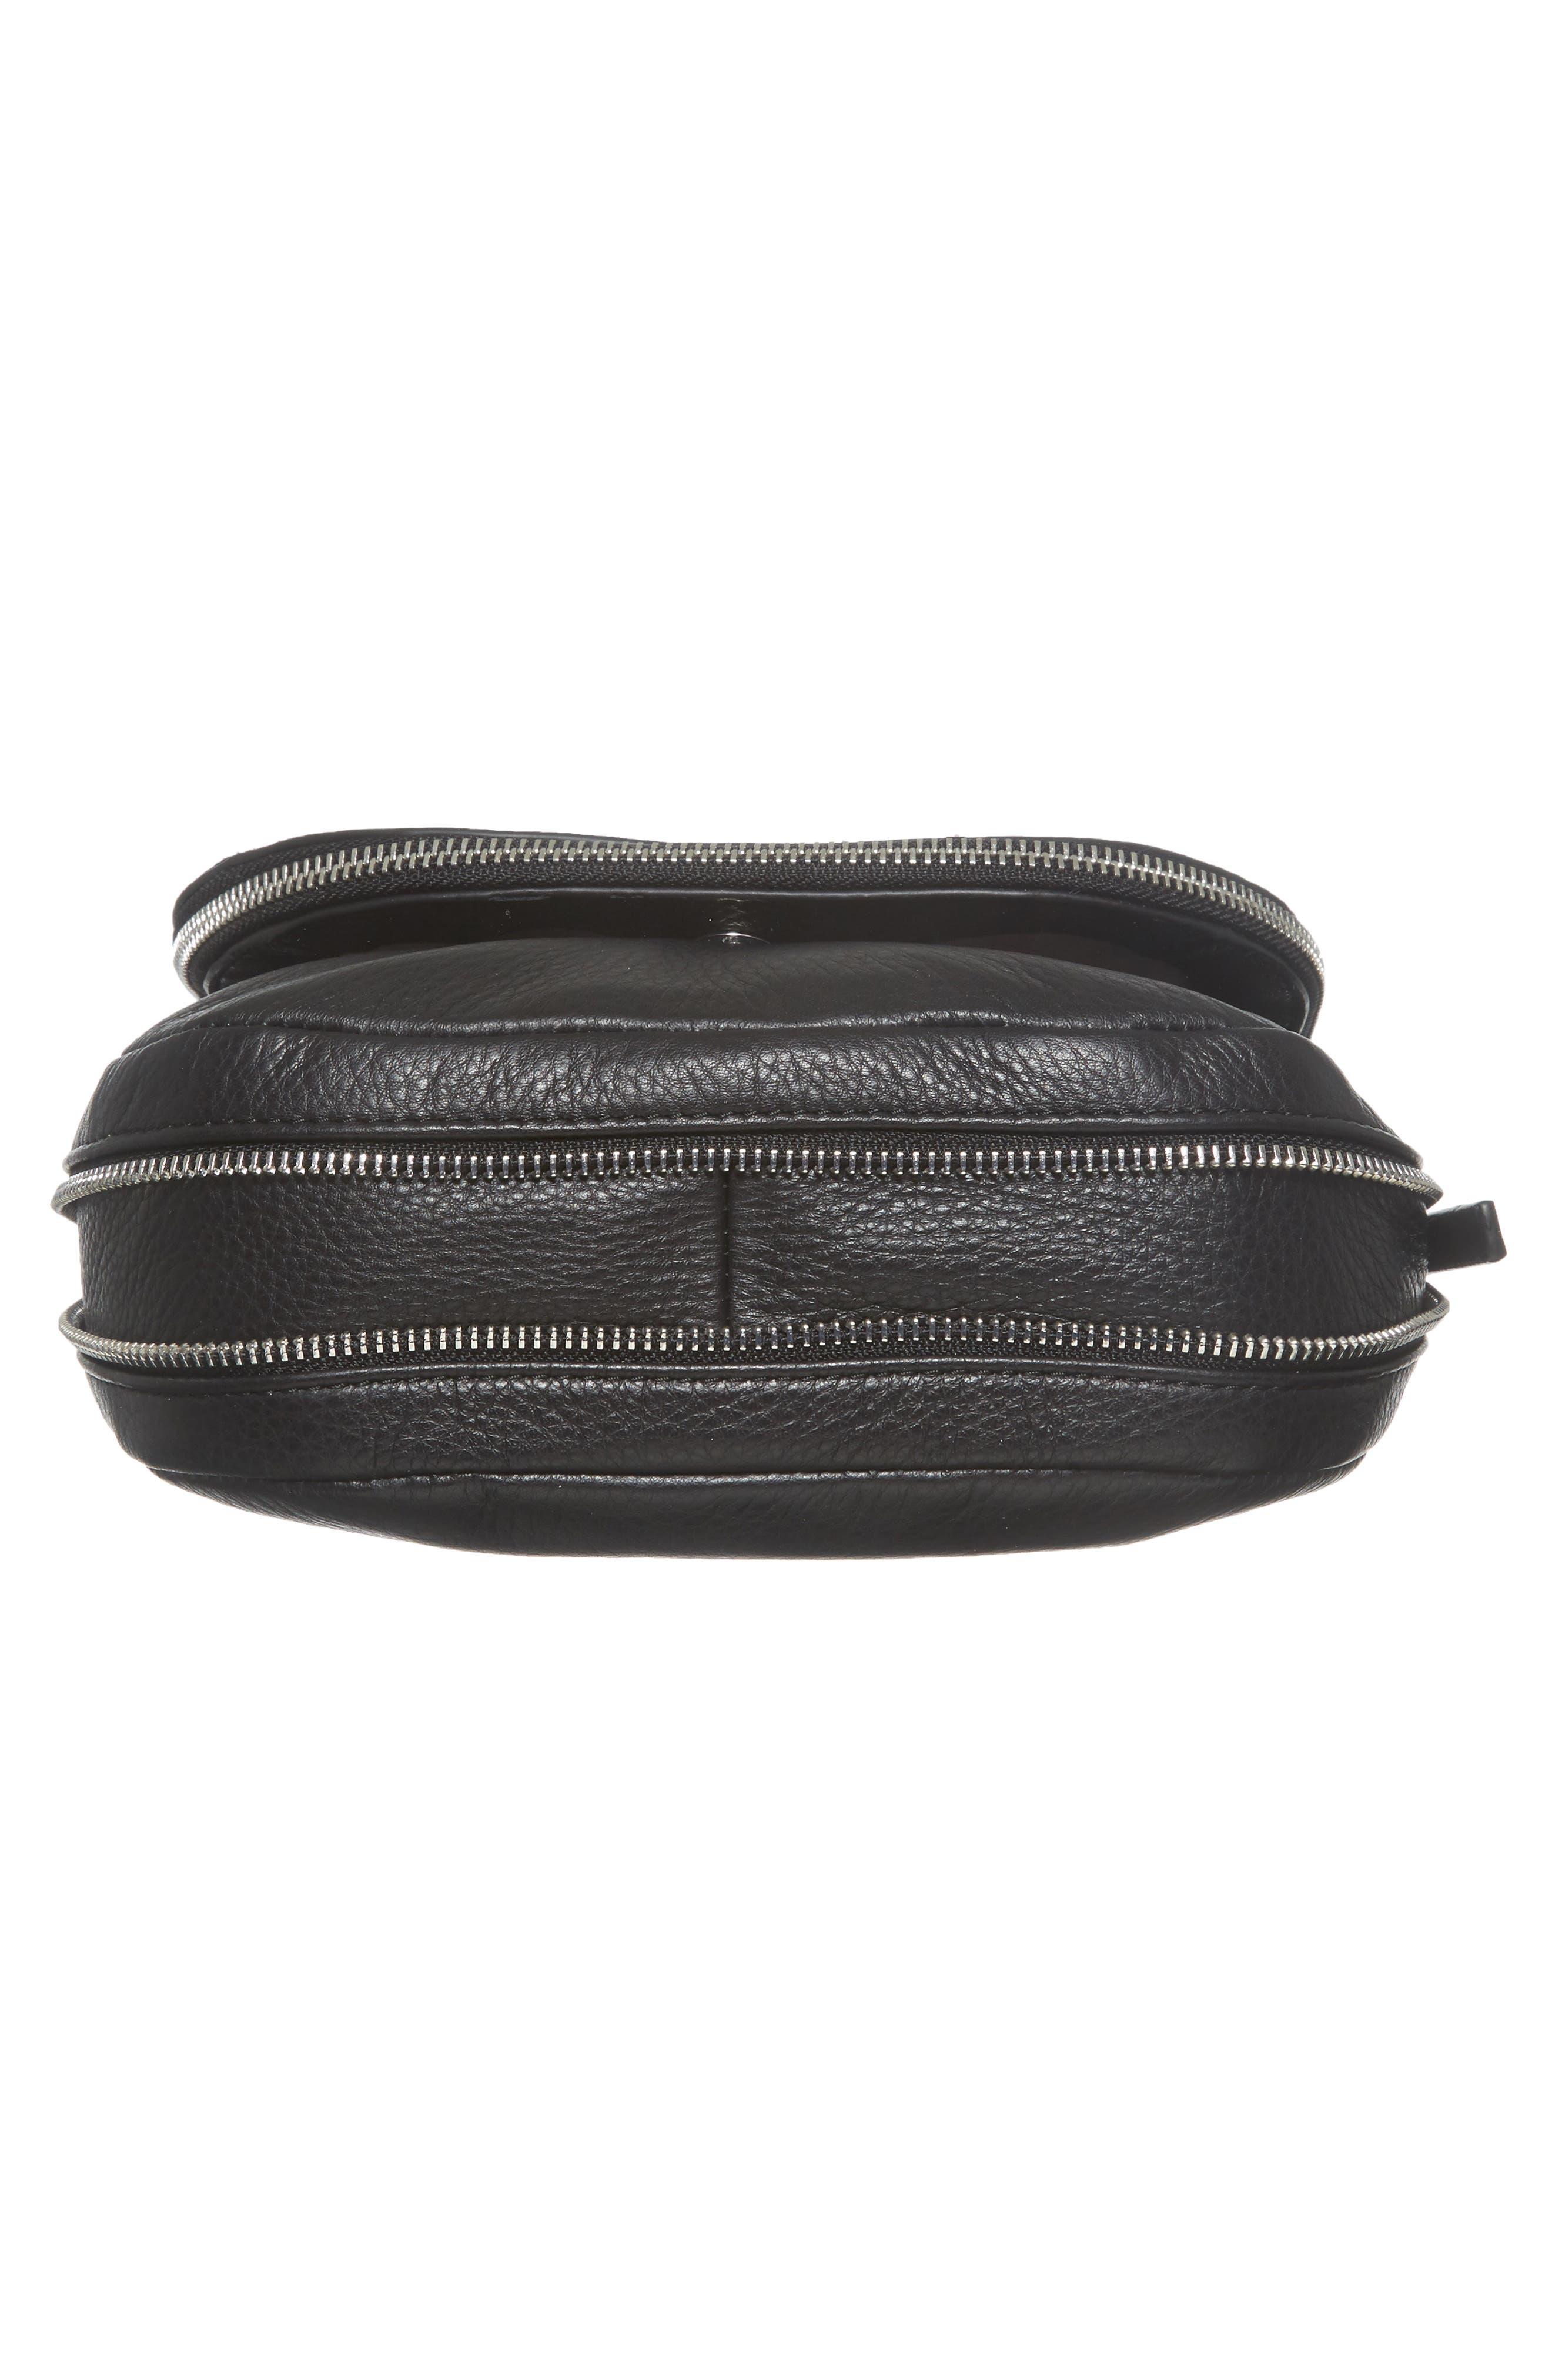 Bonny Studded Leather Crossbody Bag,                             Alternate thumbnail 11, color,